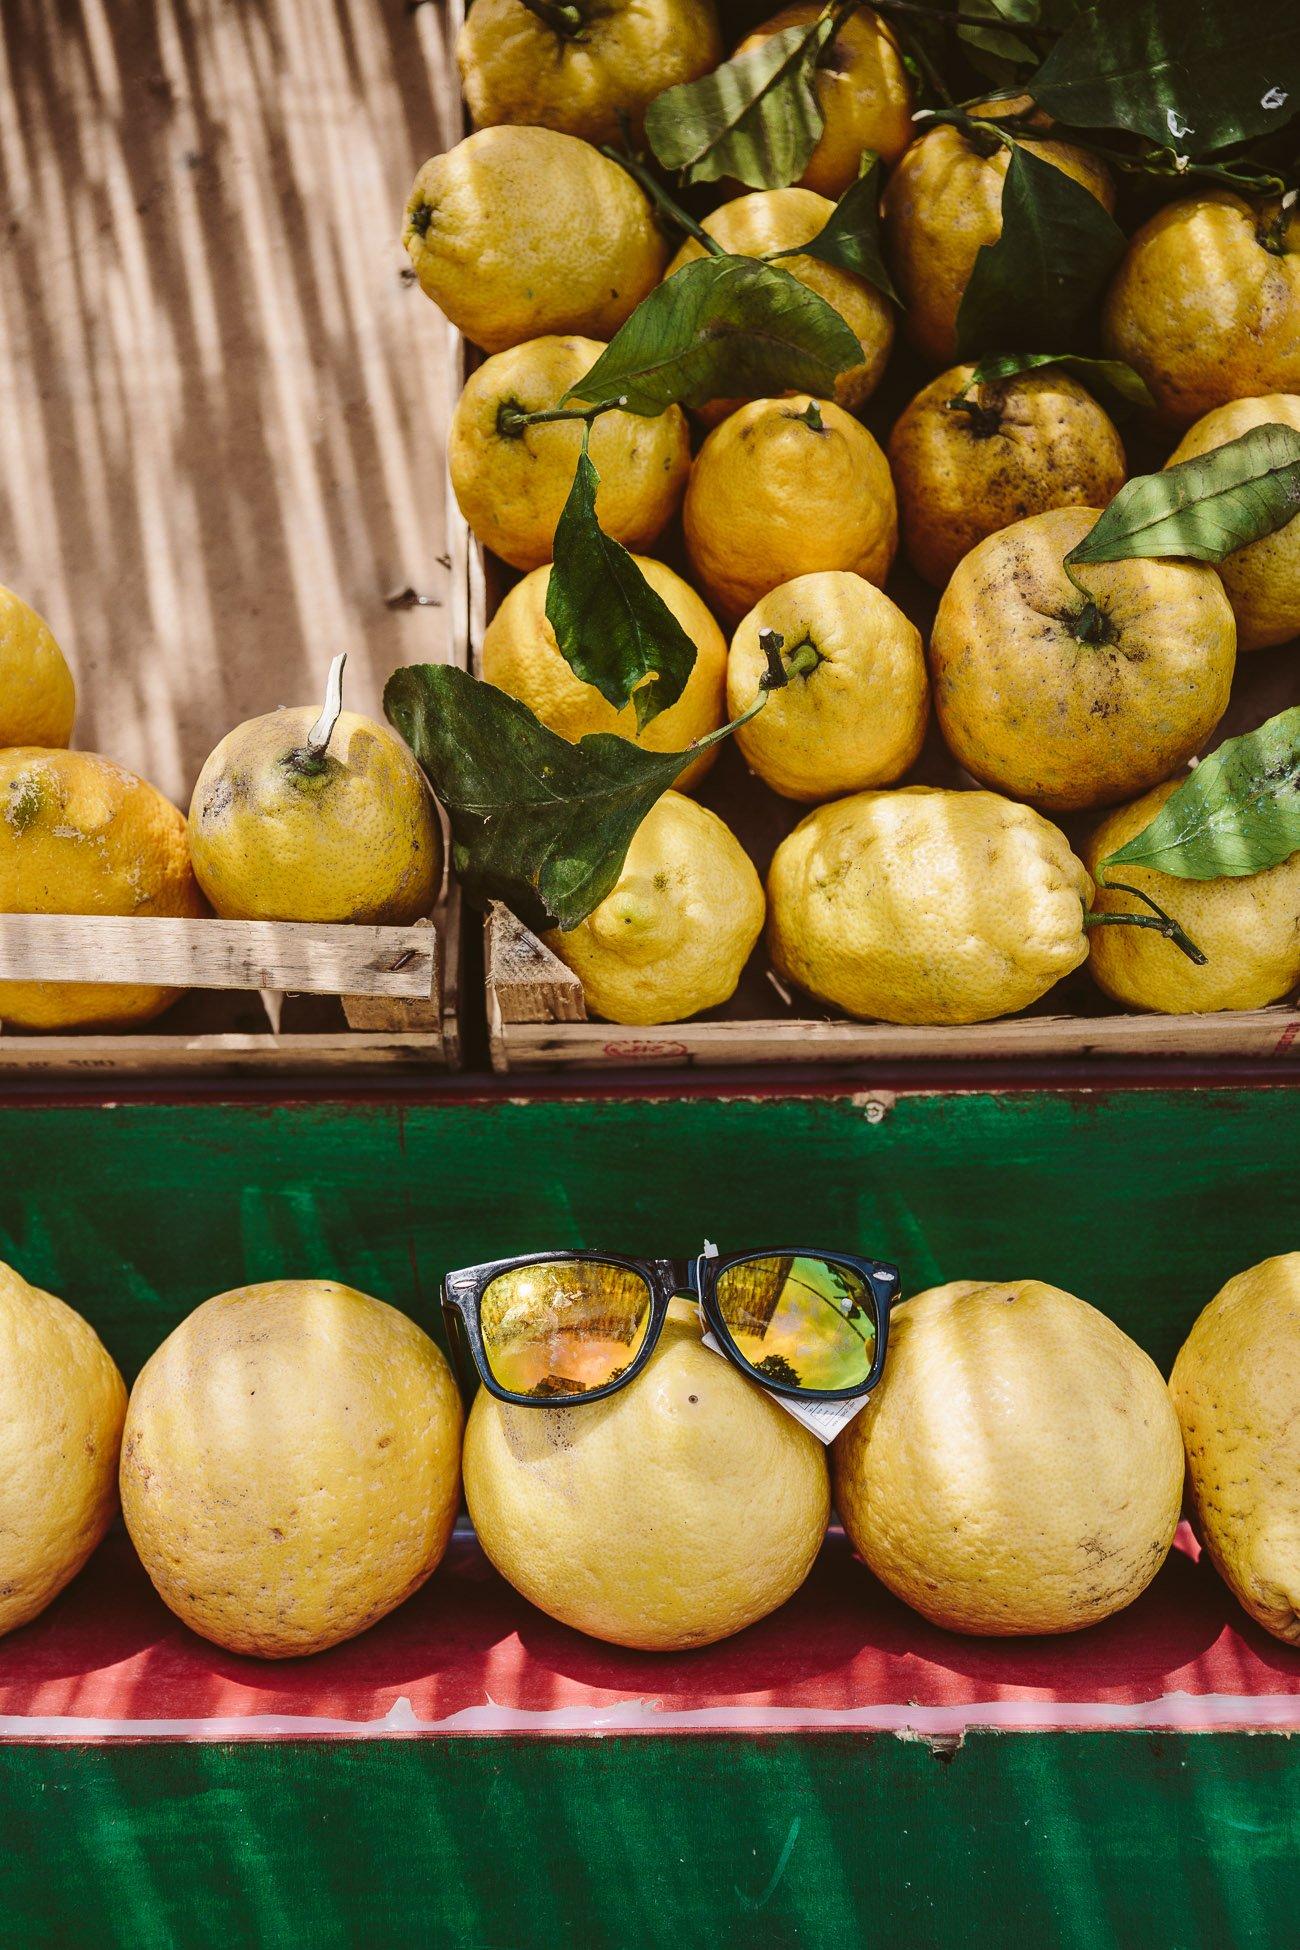 Lemon stand at the Amalfi Coast